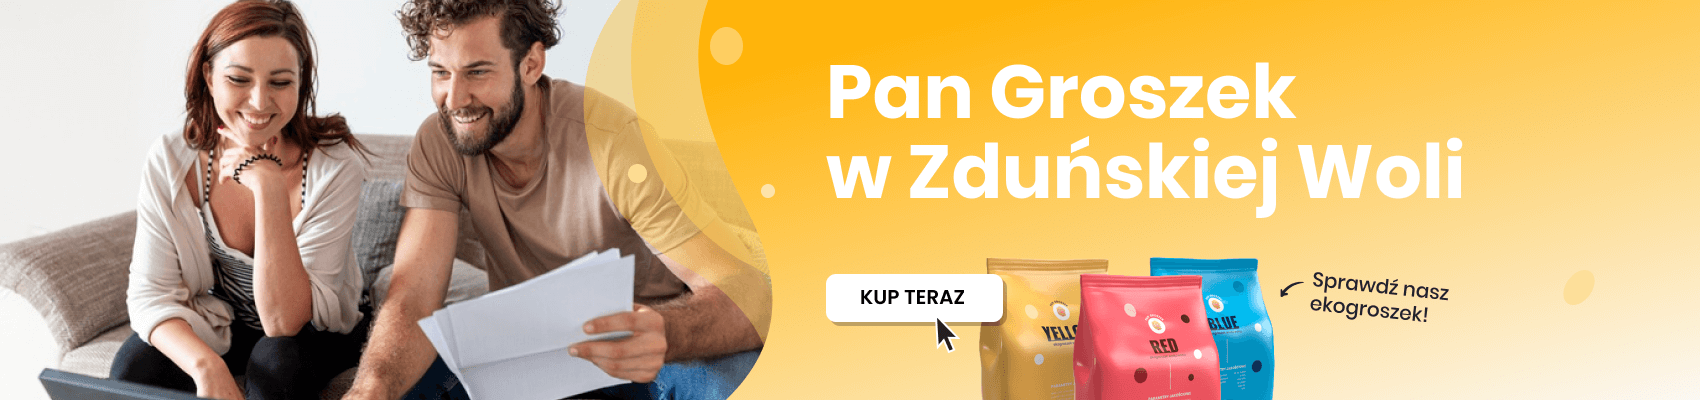 Ekogroszek workowany - Zduńska Wola